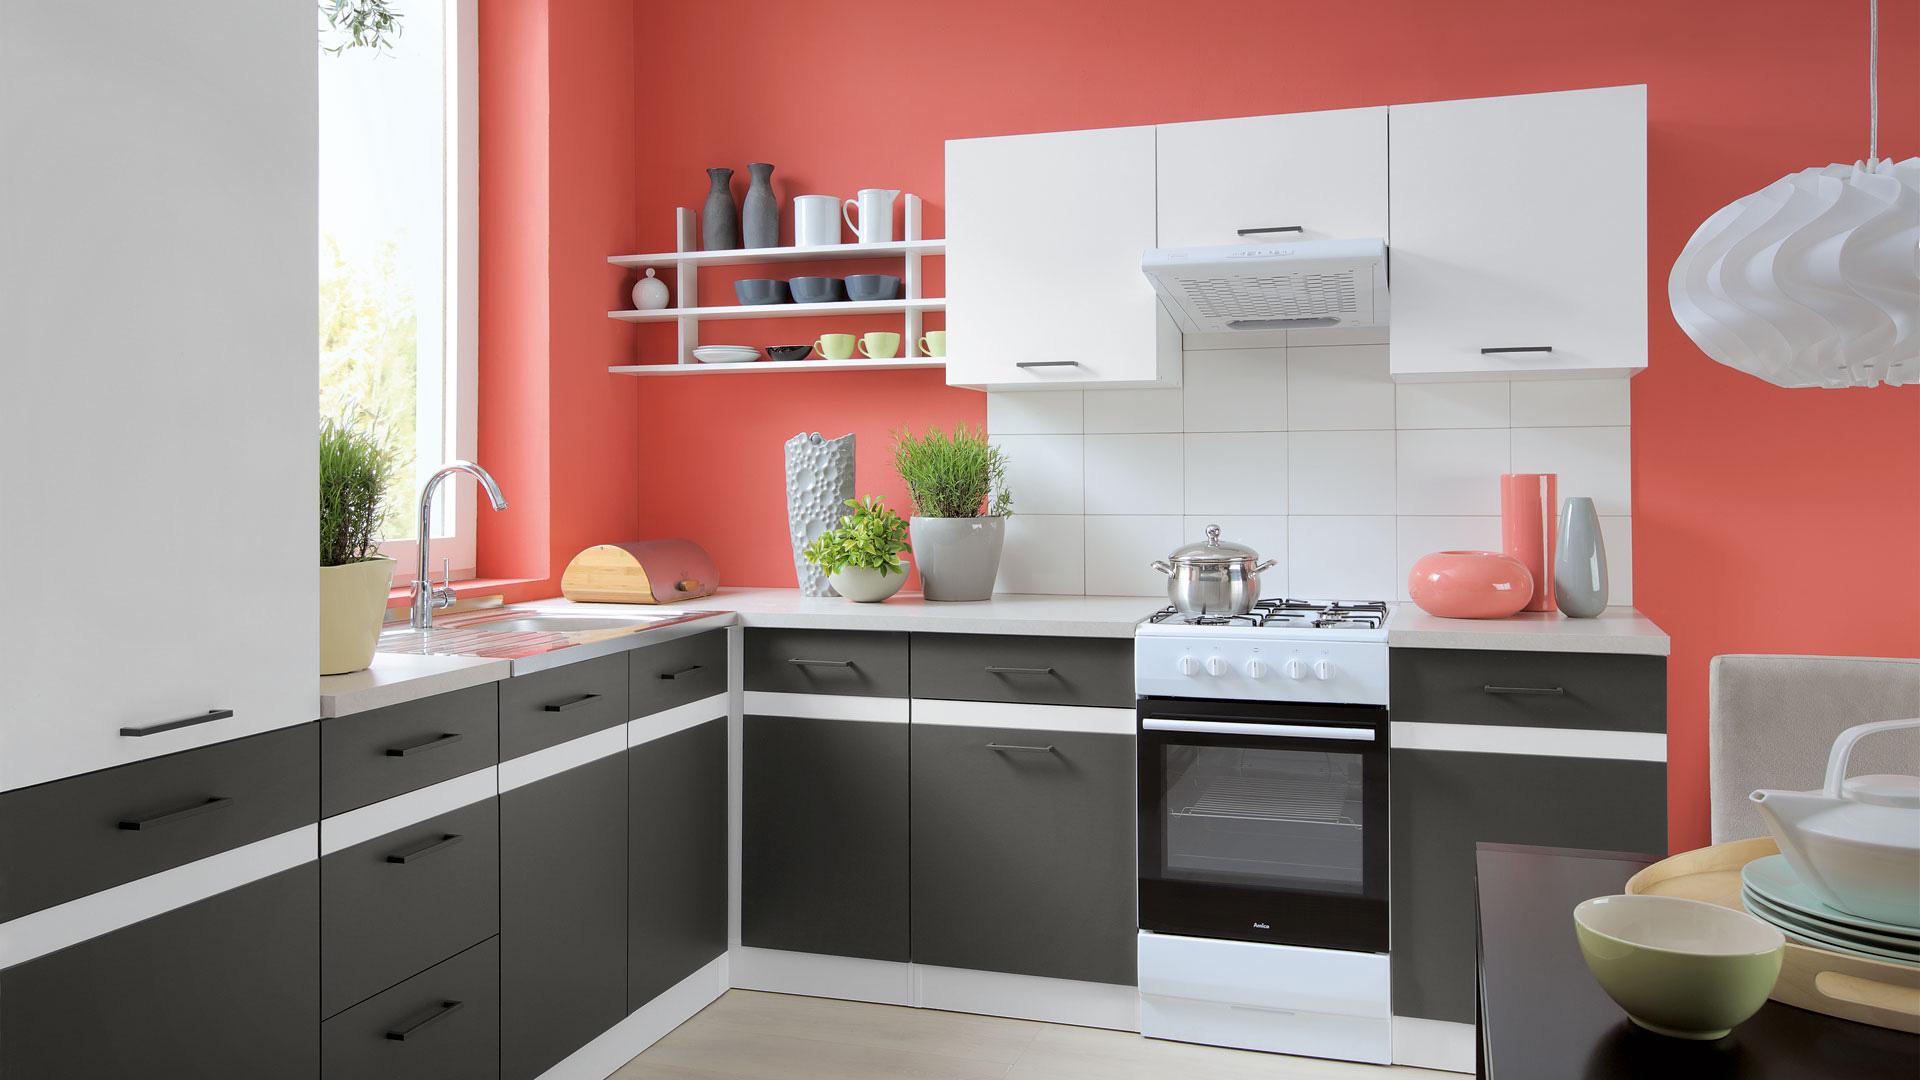 Küchen Grau Weiß – sehremini